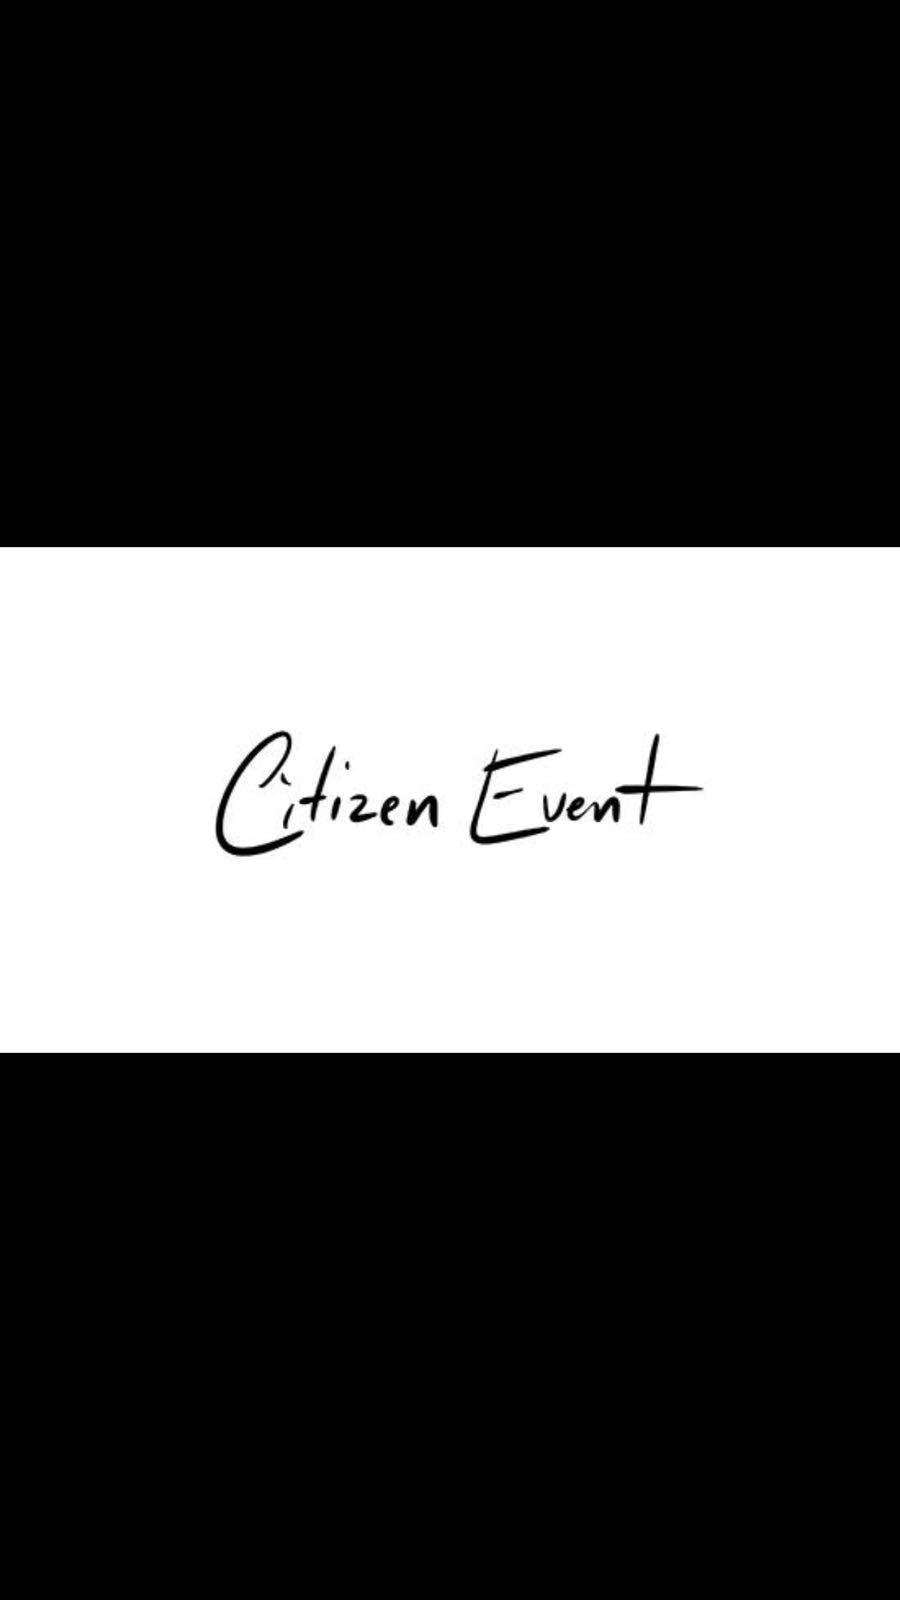 Citizen Event